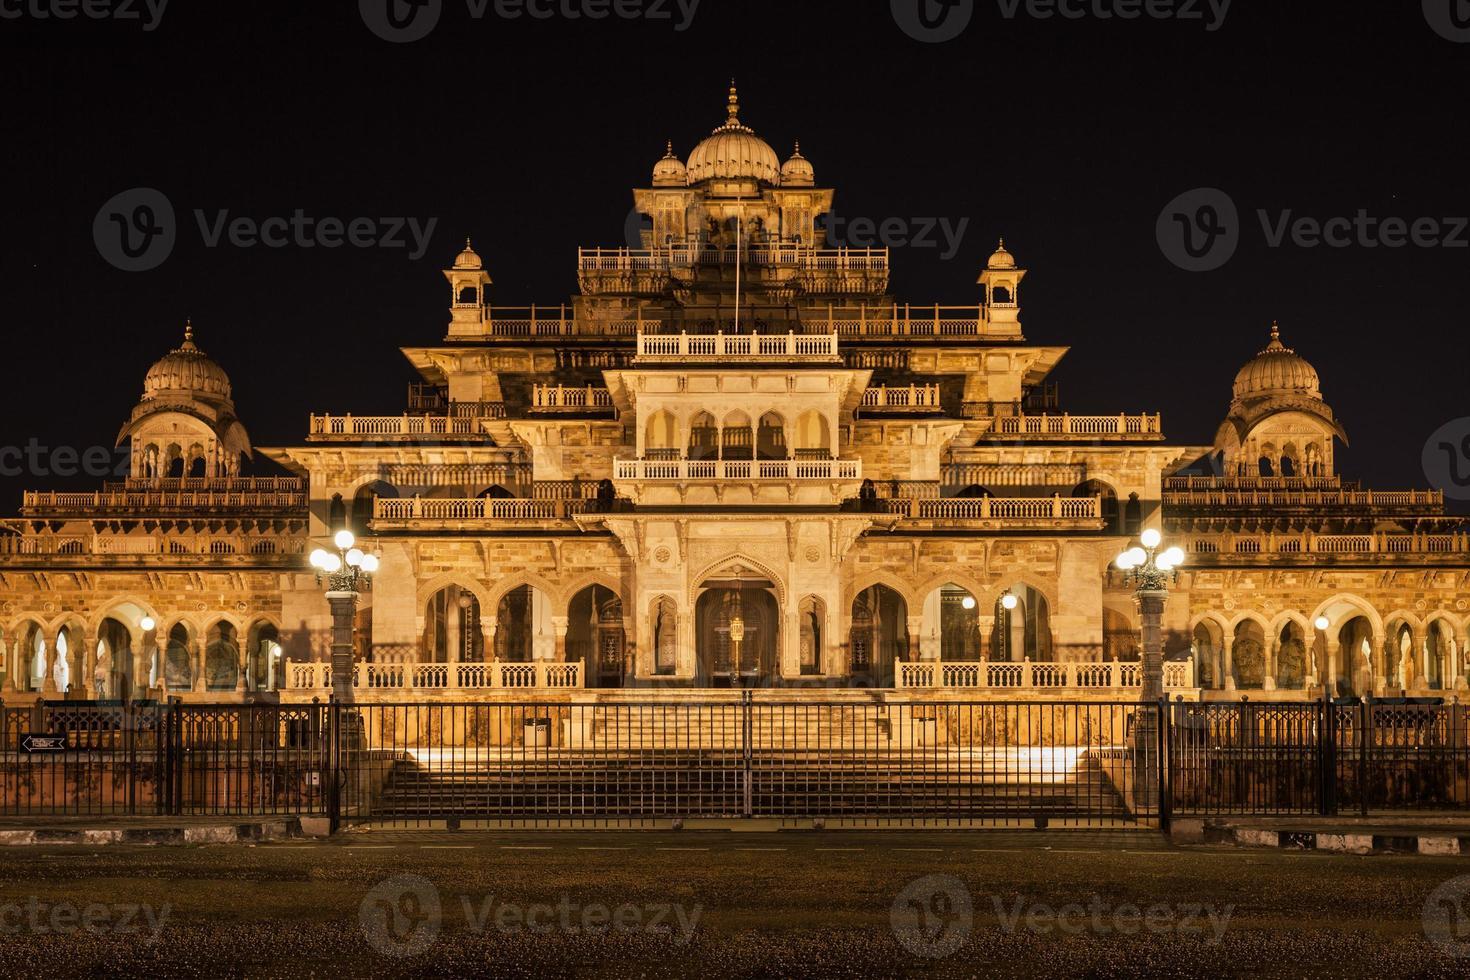 Albert Hall (museo central), Jaipur foto